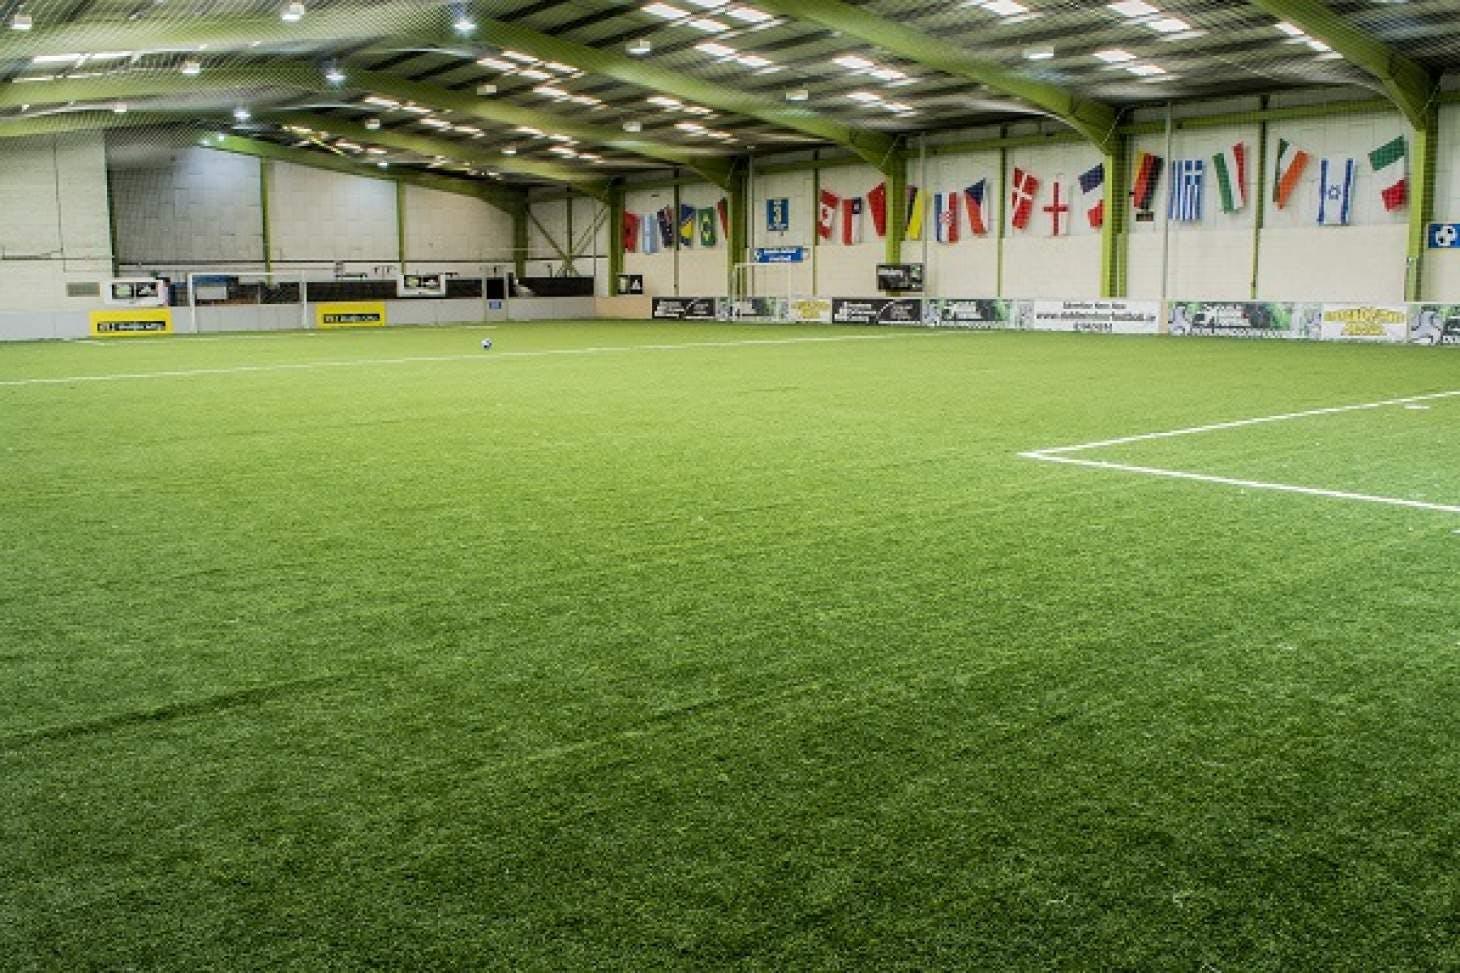 Dublin Indoor Football Full size | 3G Astroturf gaa pitch